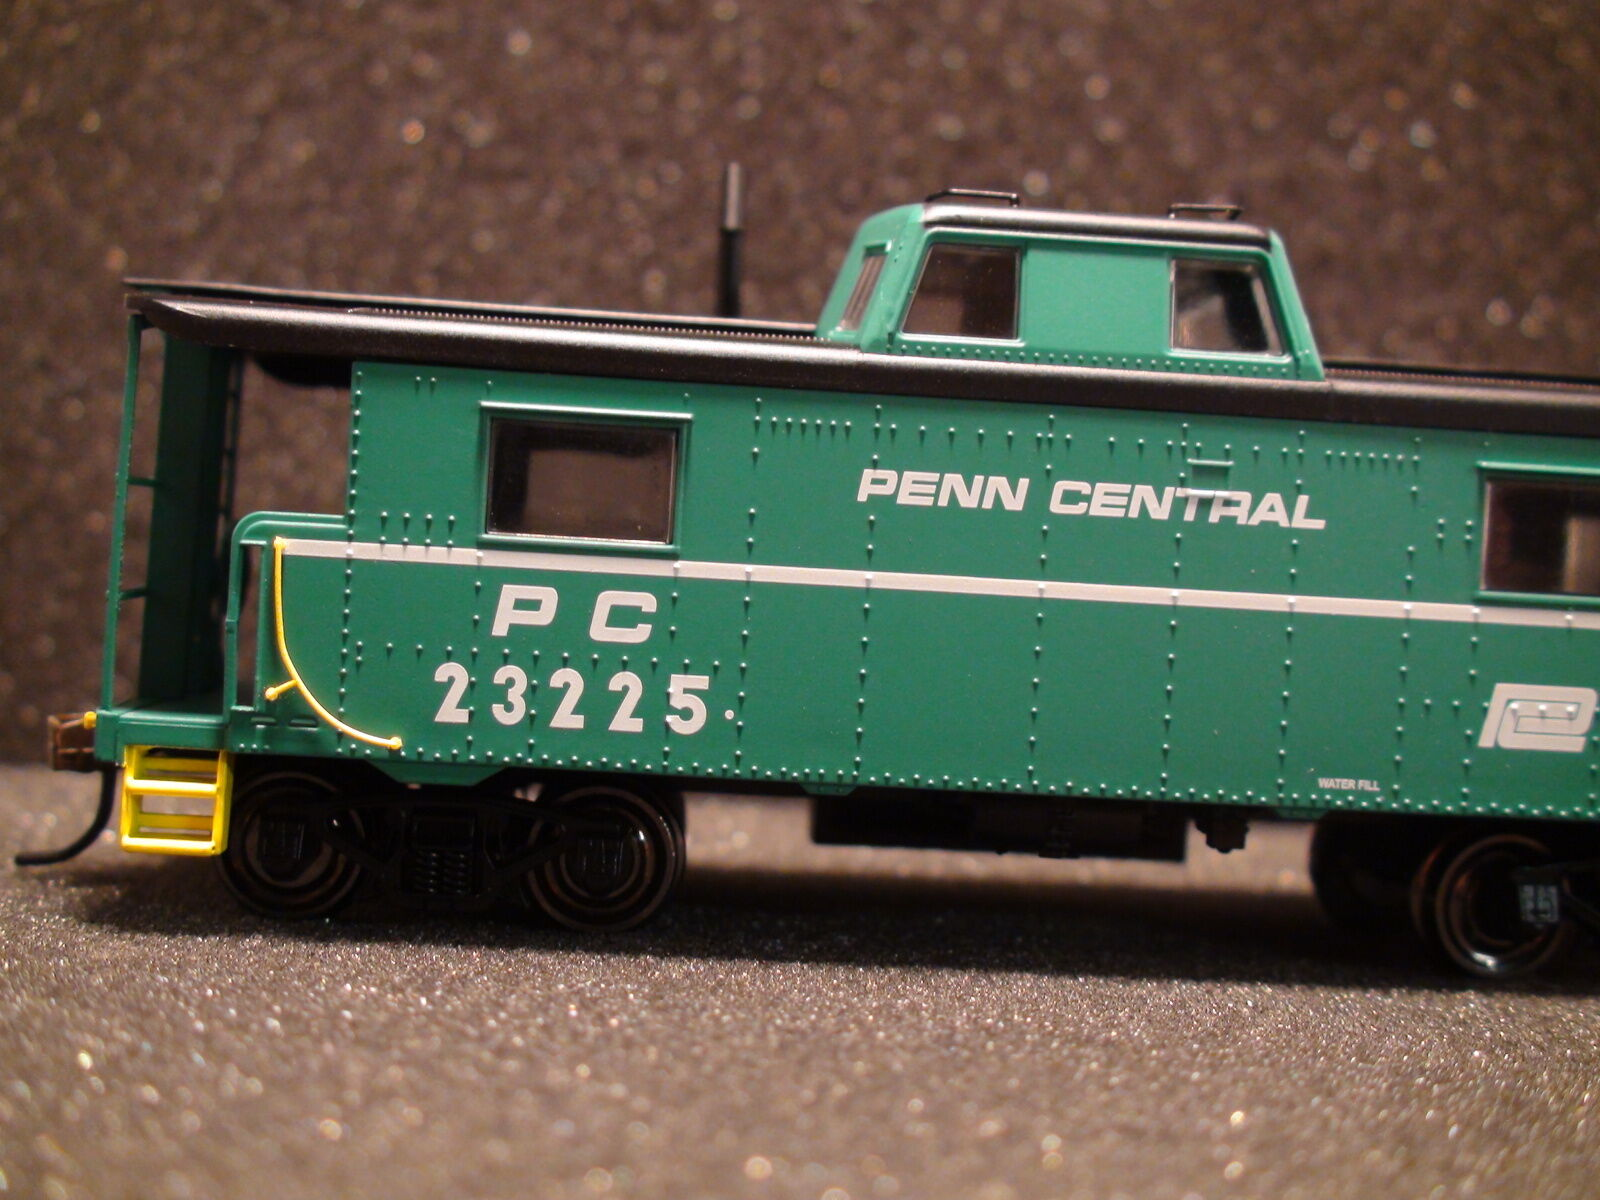 Bowser N-8 furgón de cola PC Keystone Road línea Ejecutivo Central Penn